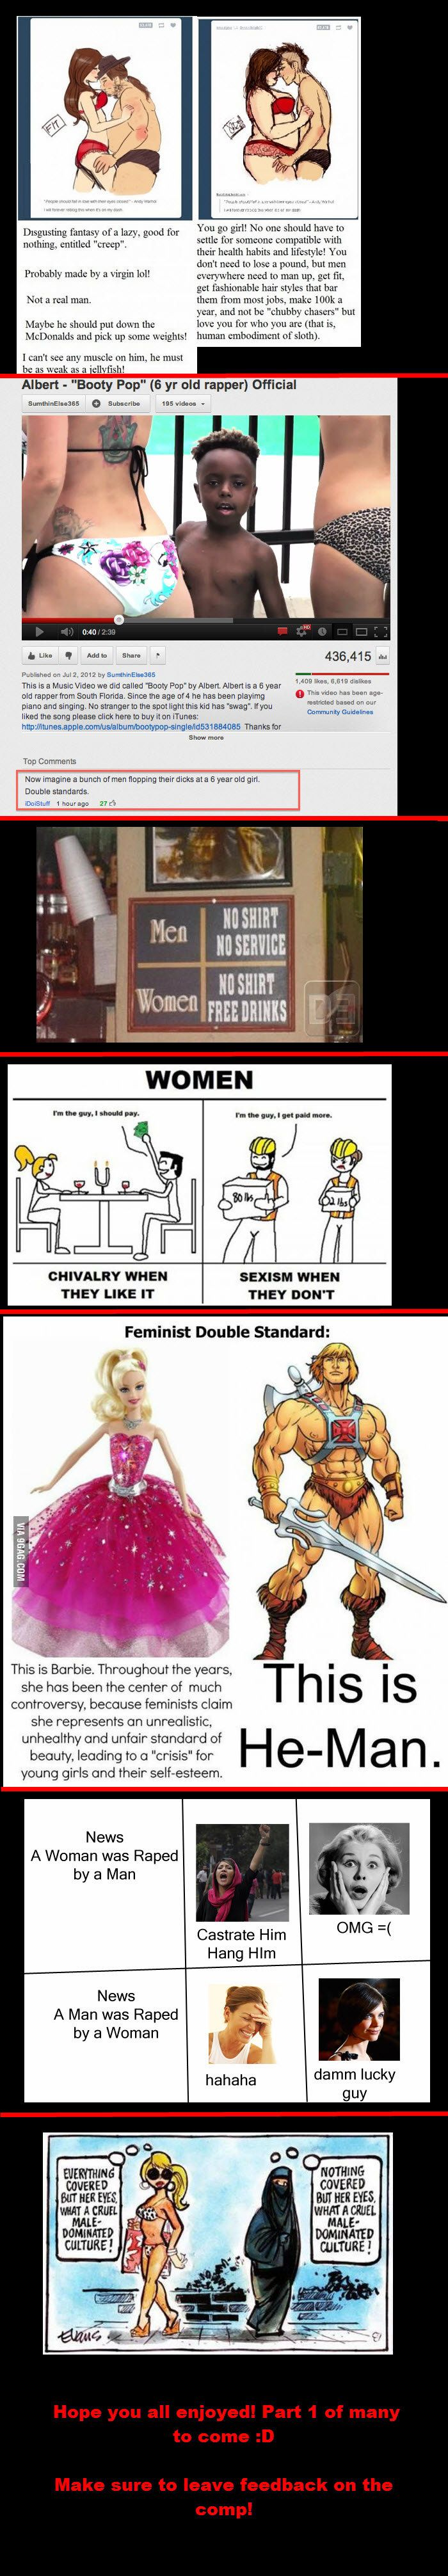 Double Standards - Imgur